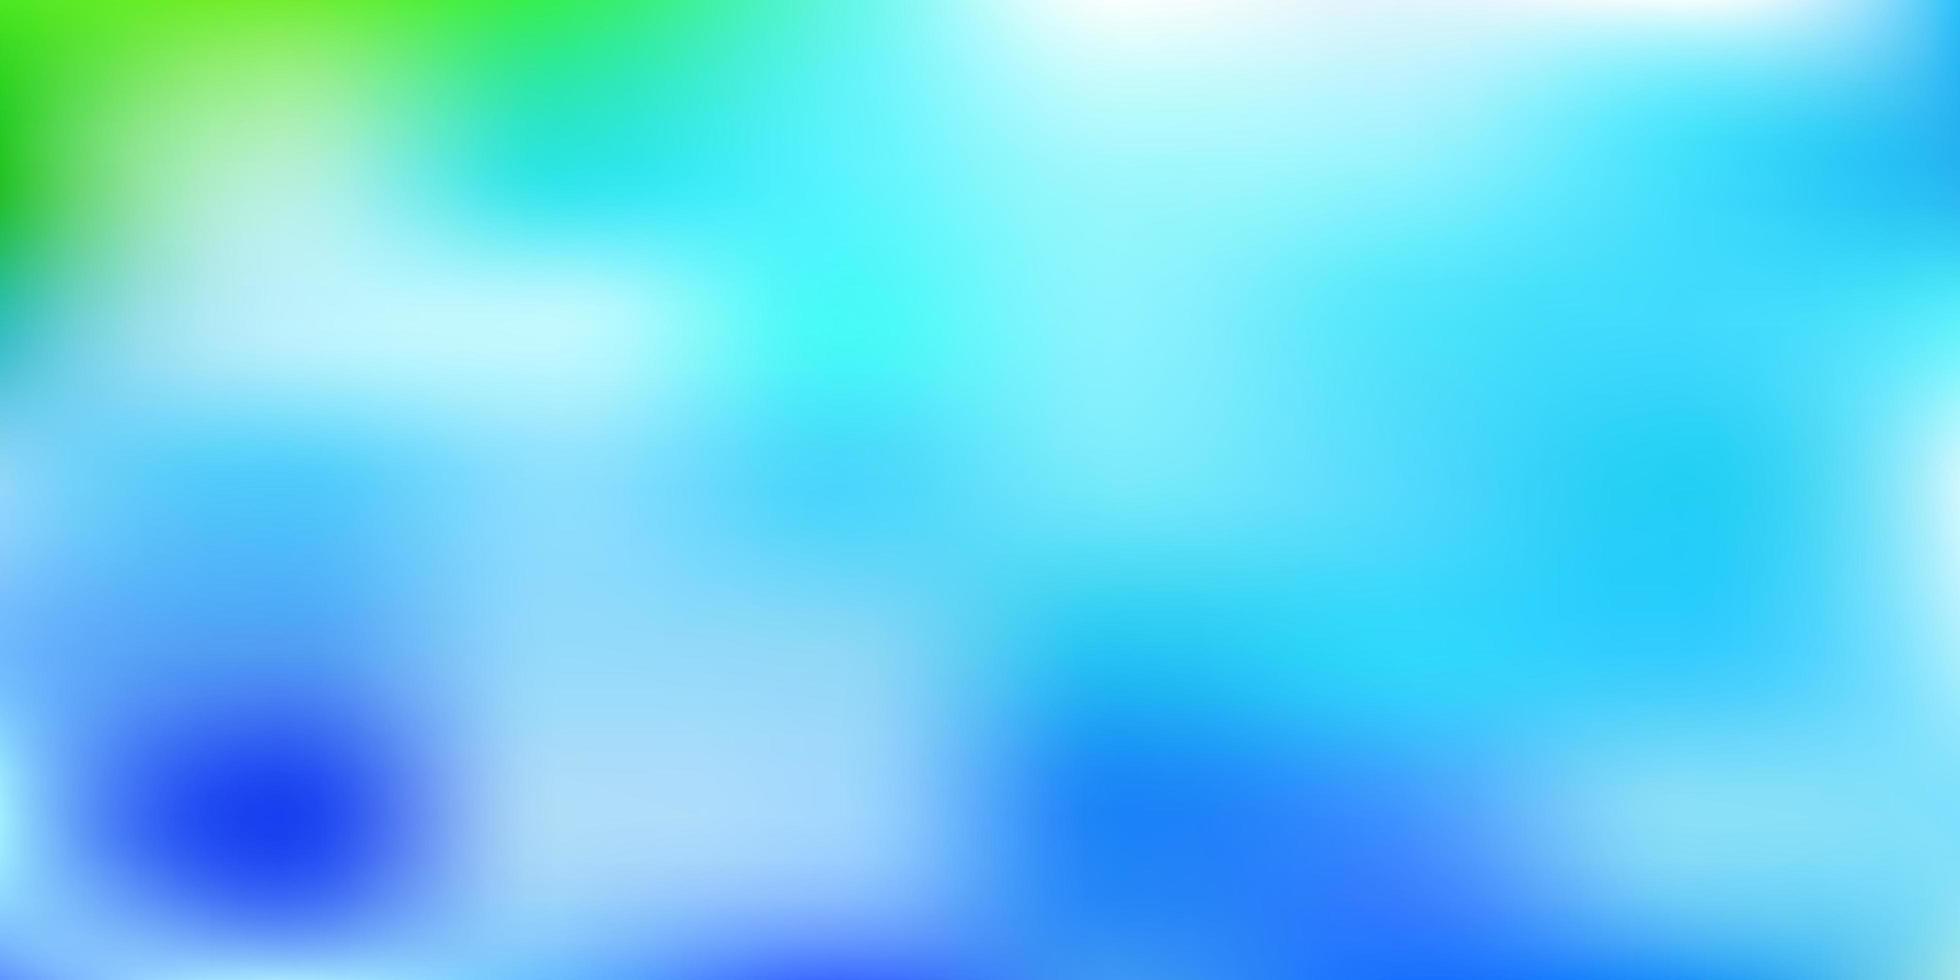 plantilla de desenfoque de vector azul claro, verde.